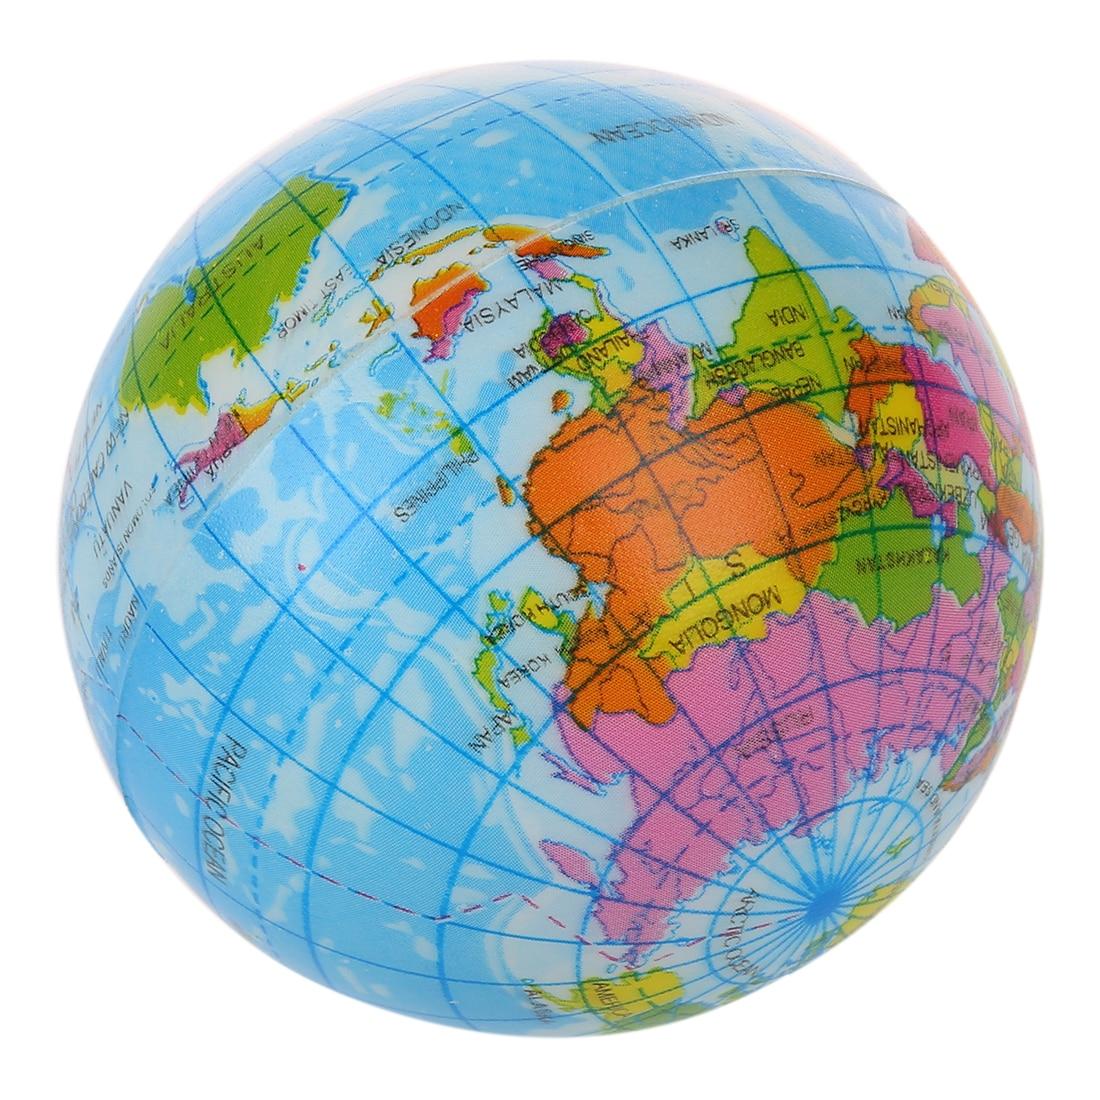 NEW WORLD MAP FOAM EARTH GLOBE STRESS RELIEF BOUNCY BALL